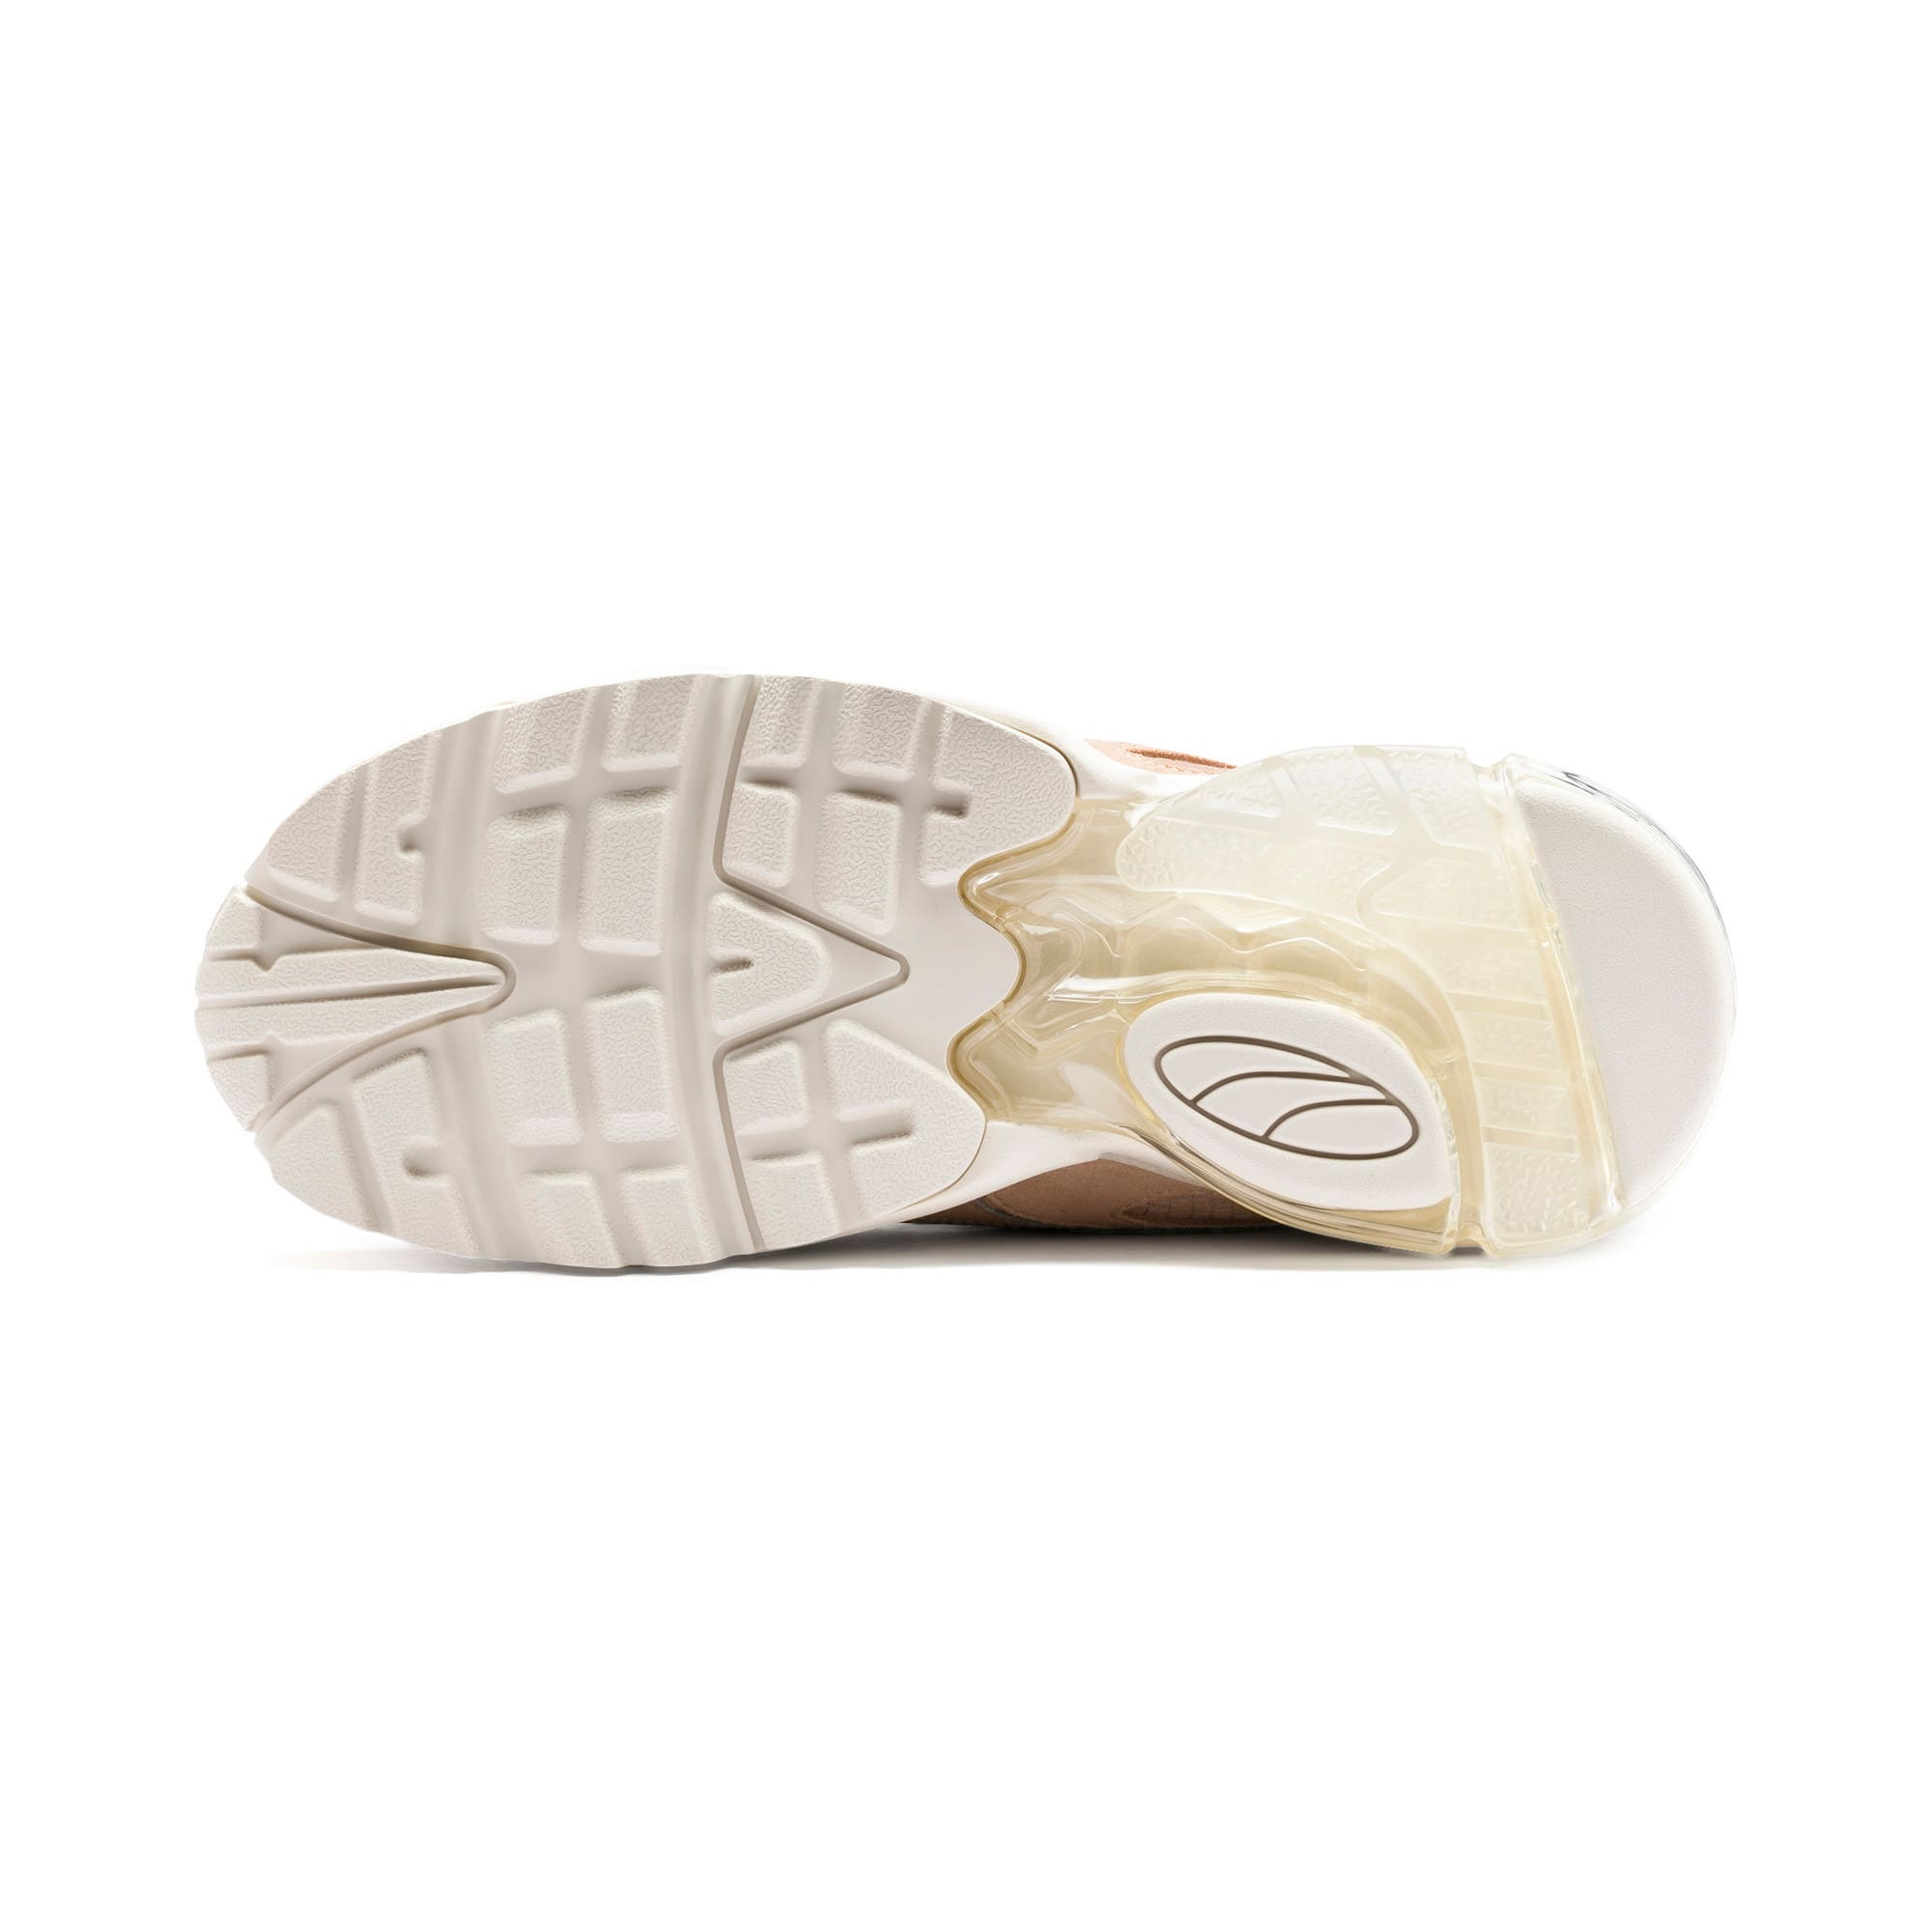 Thumbnail 4 of CELL Stellar Tonal Women's Sneakers, Nougat-Puma Team Gold, medium